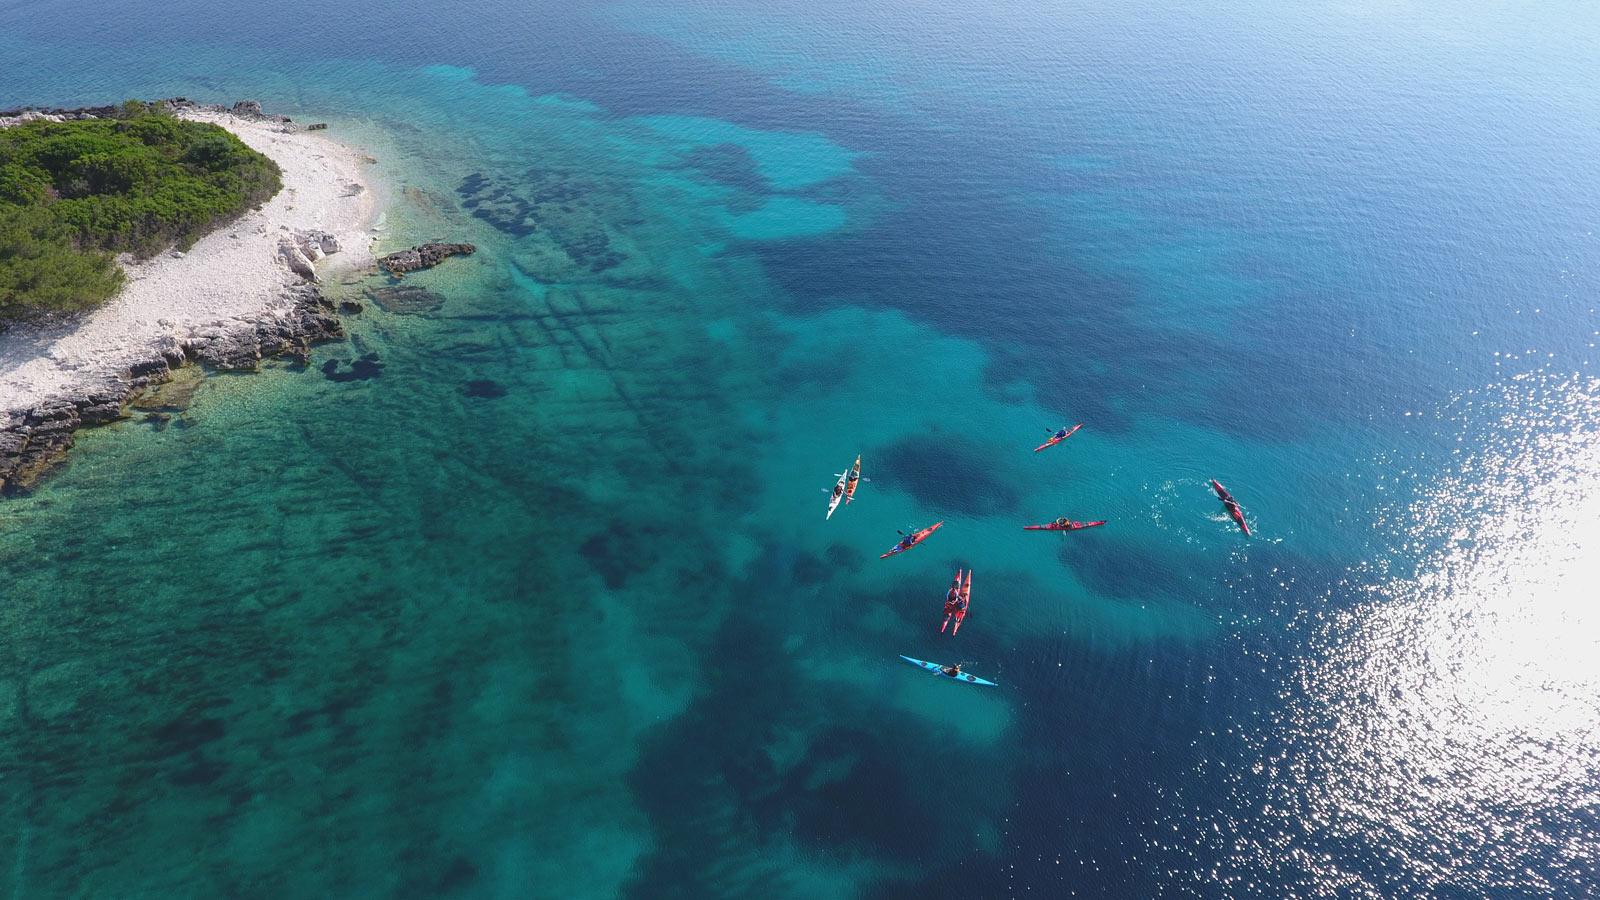 kayaks in the sea drone photo korcula